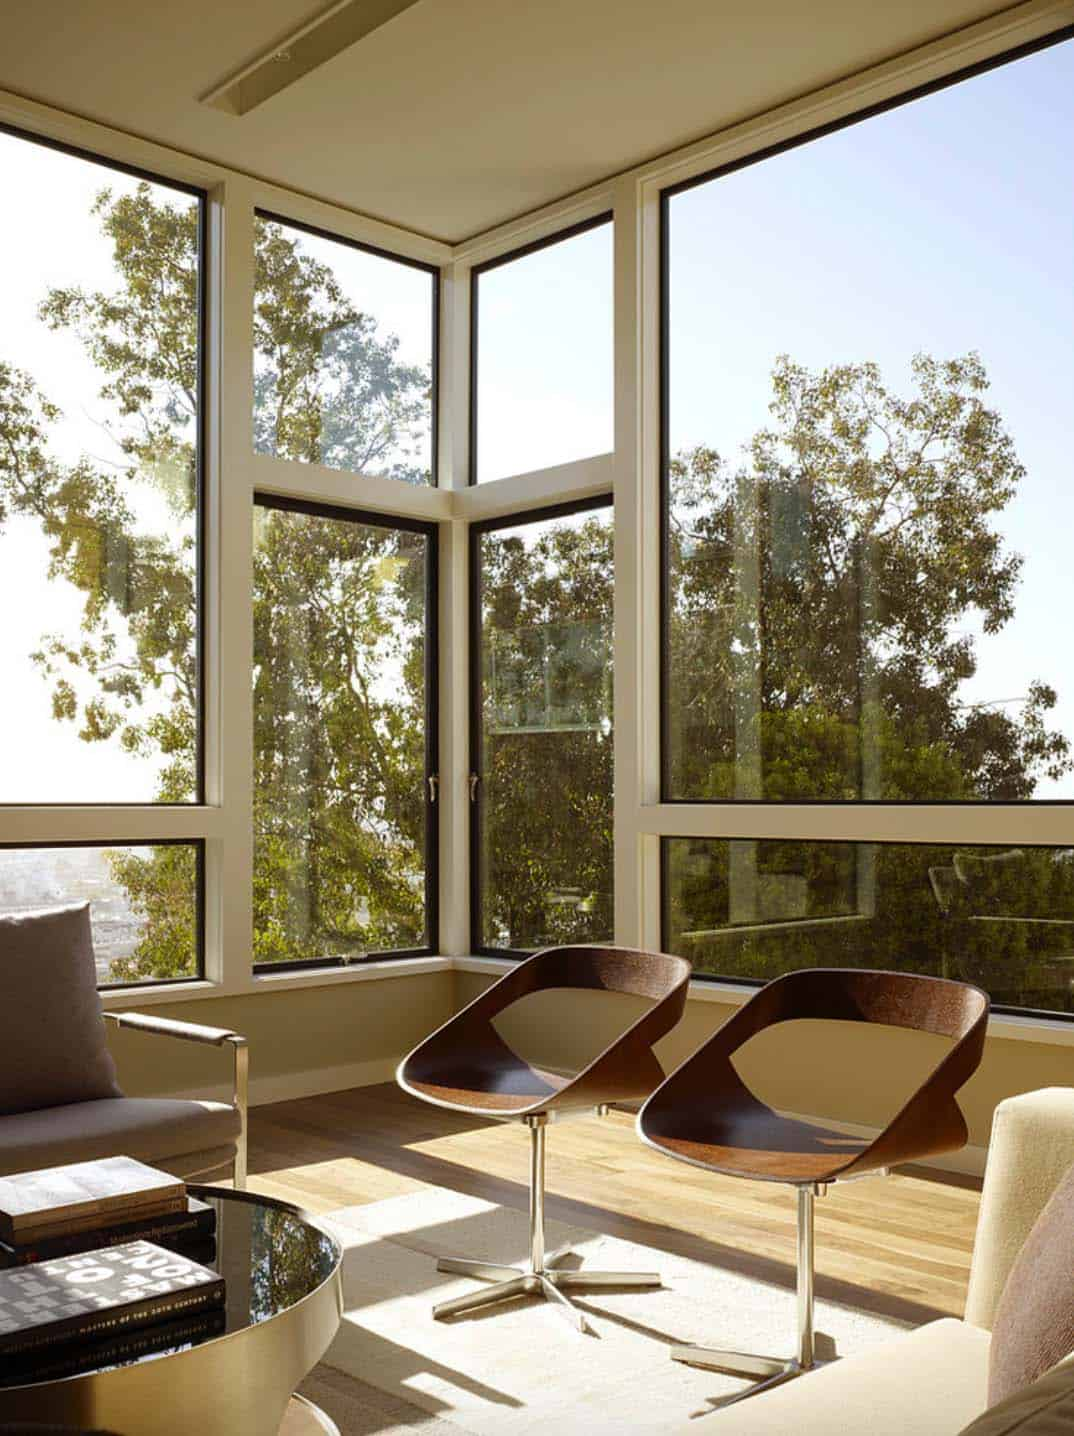 Architecture Modern Hillside Home-04-1 Kindesign